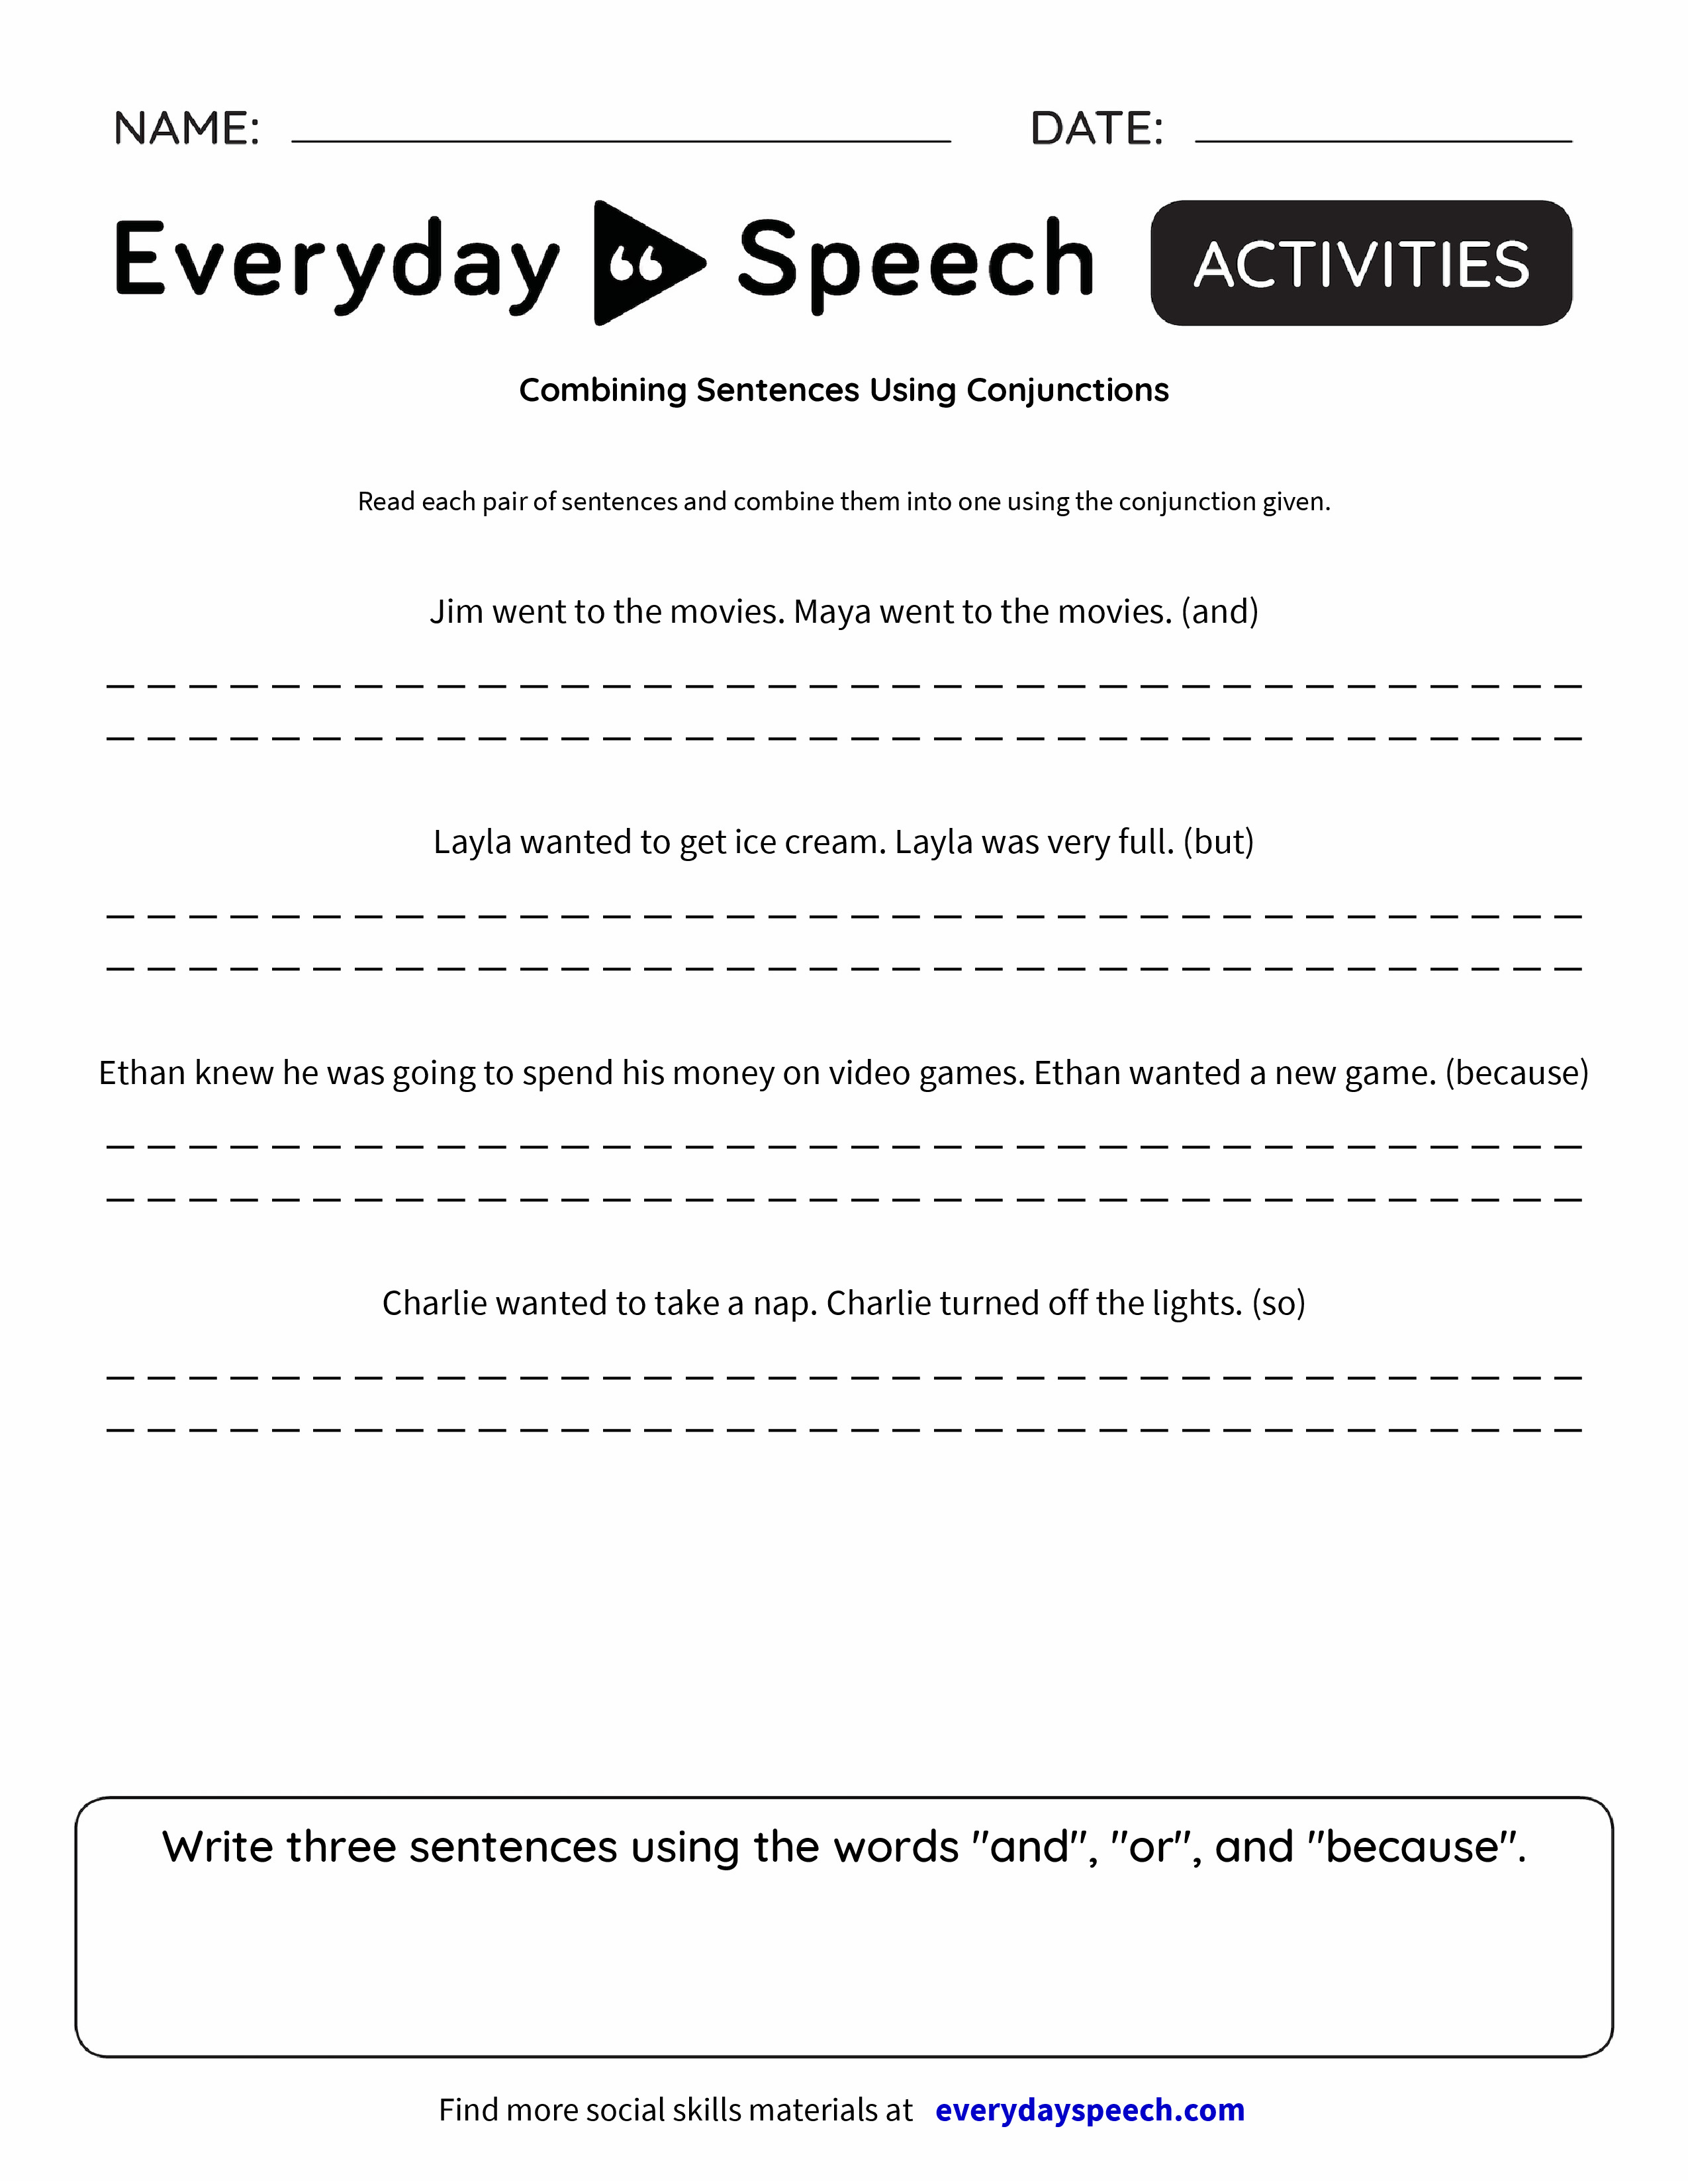 medium resolution of https://dubaikhalifas.com/combine-the-sentences-using-conjunctions-worksheet/